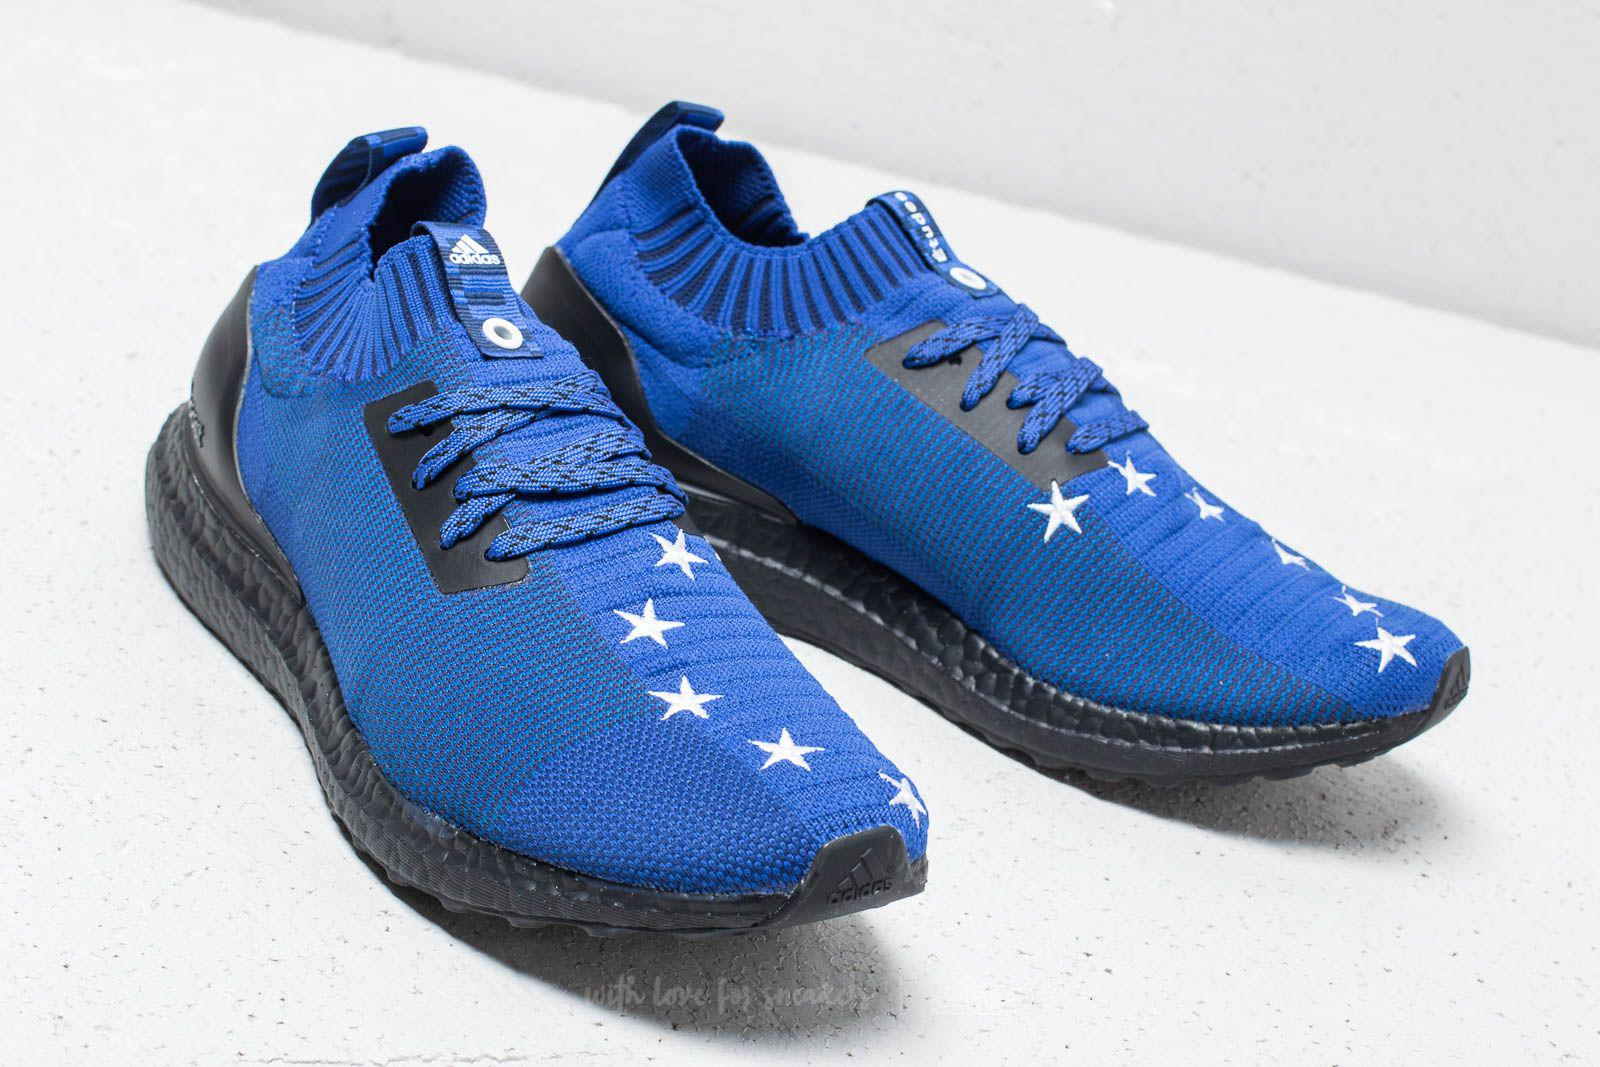 c237ba8848237 Lyst - adidas Originals Adidas Ultra Boost Uncaged X Études Bold ...